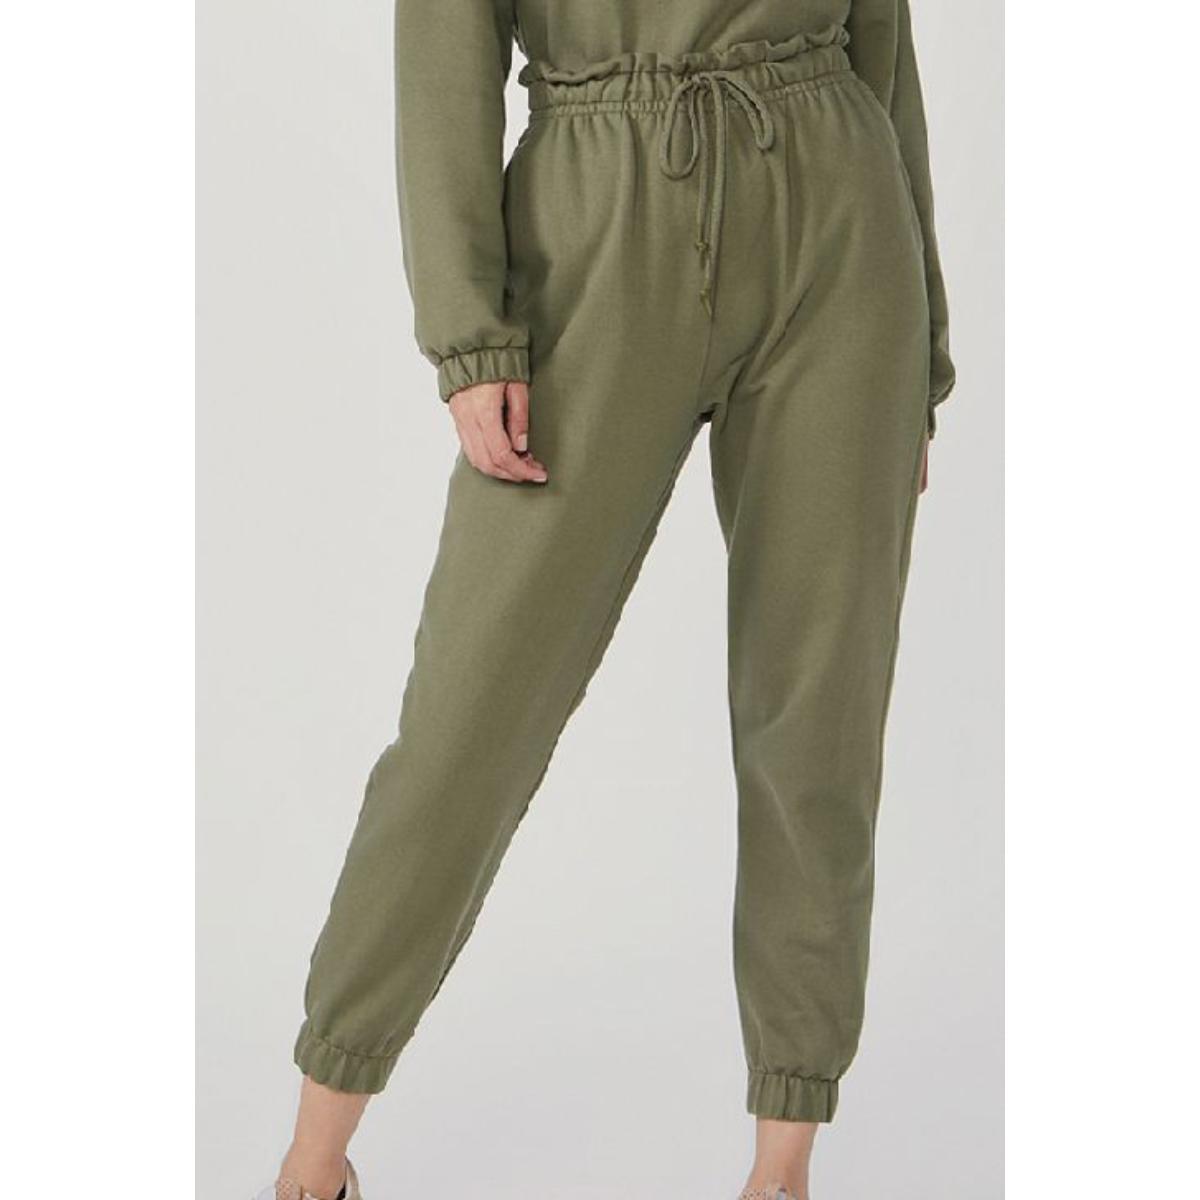 Calça Feminina Hering 05z5 Eacen Militar